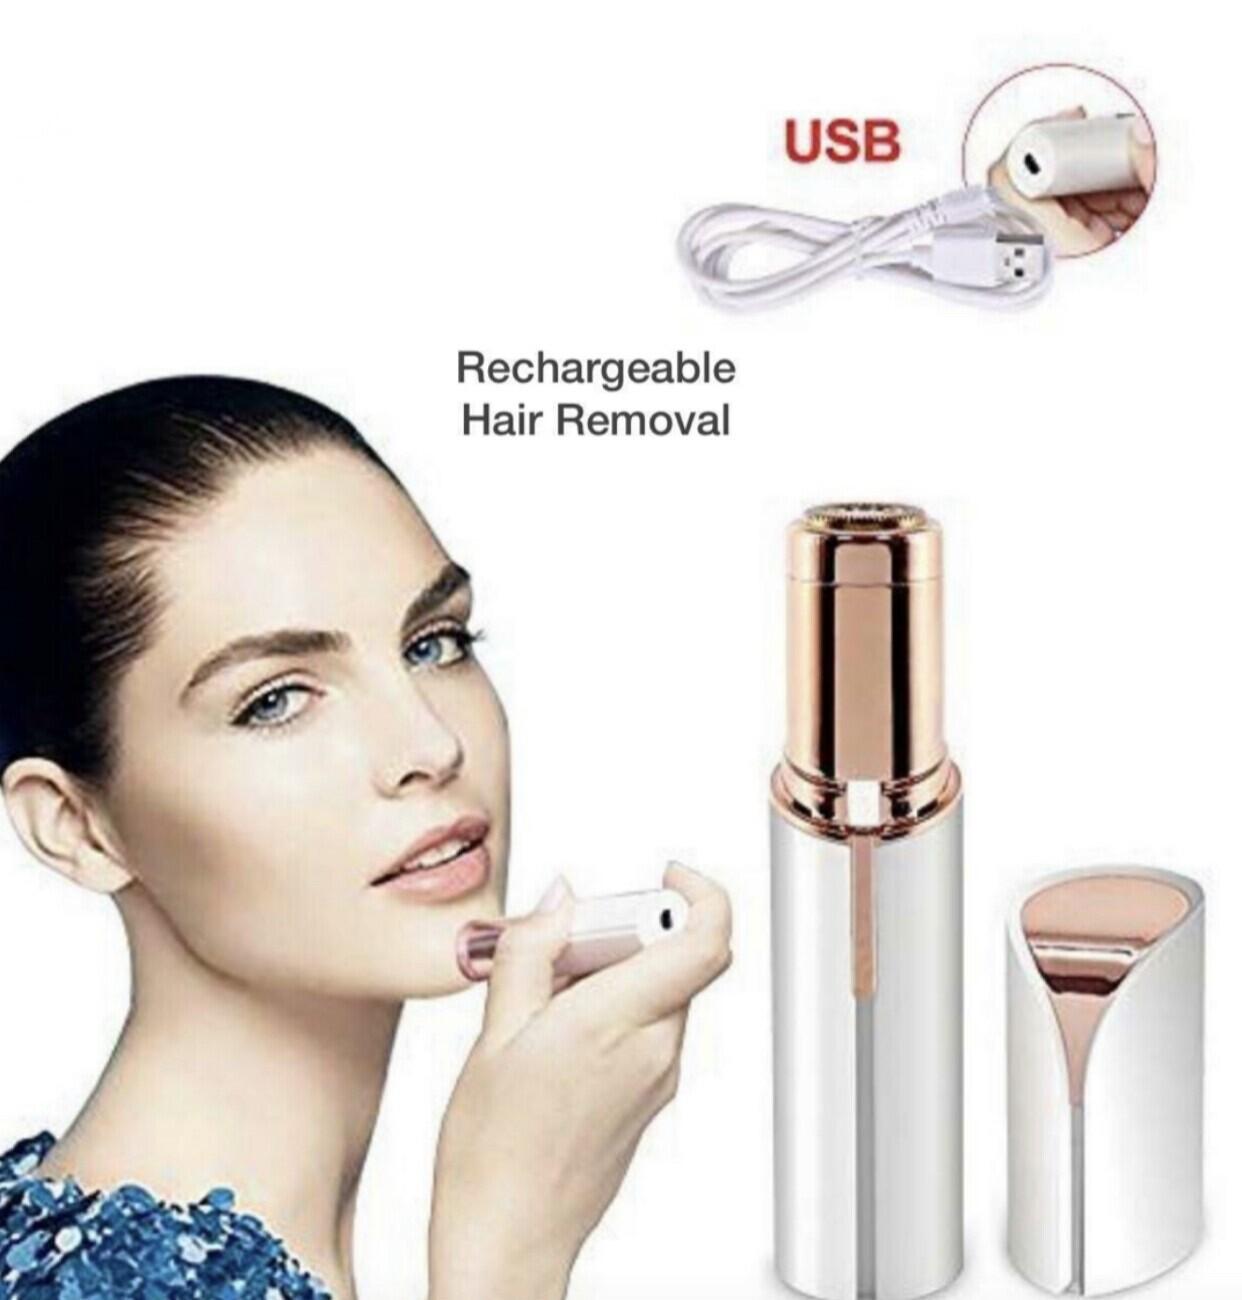 Rechargeable Facial Hair Remover